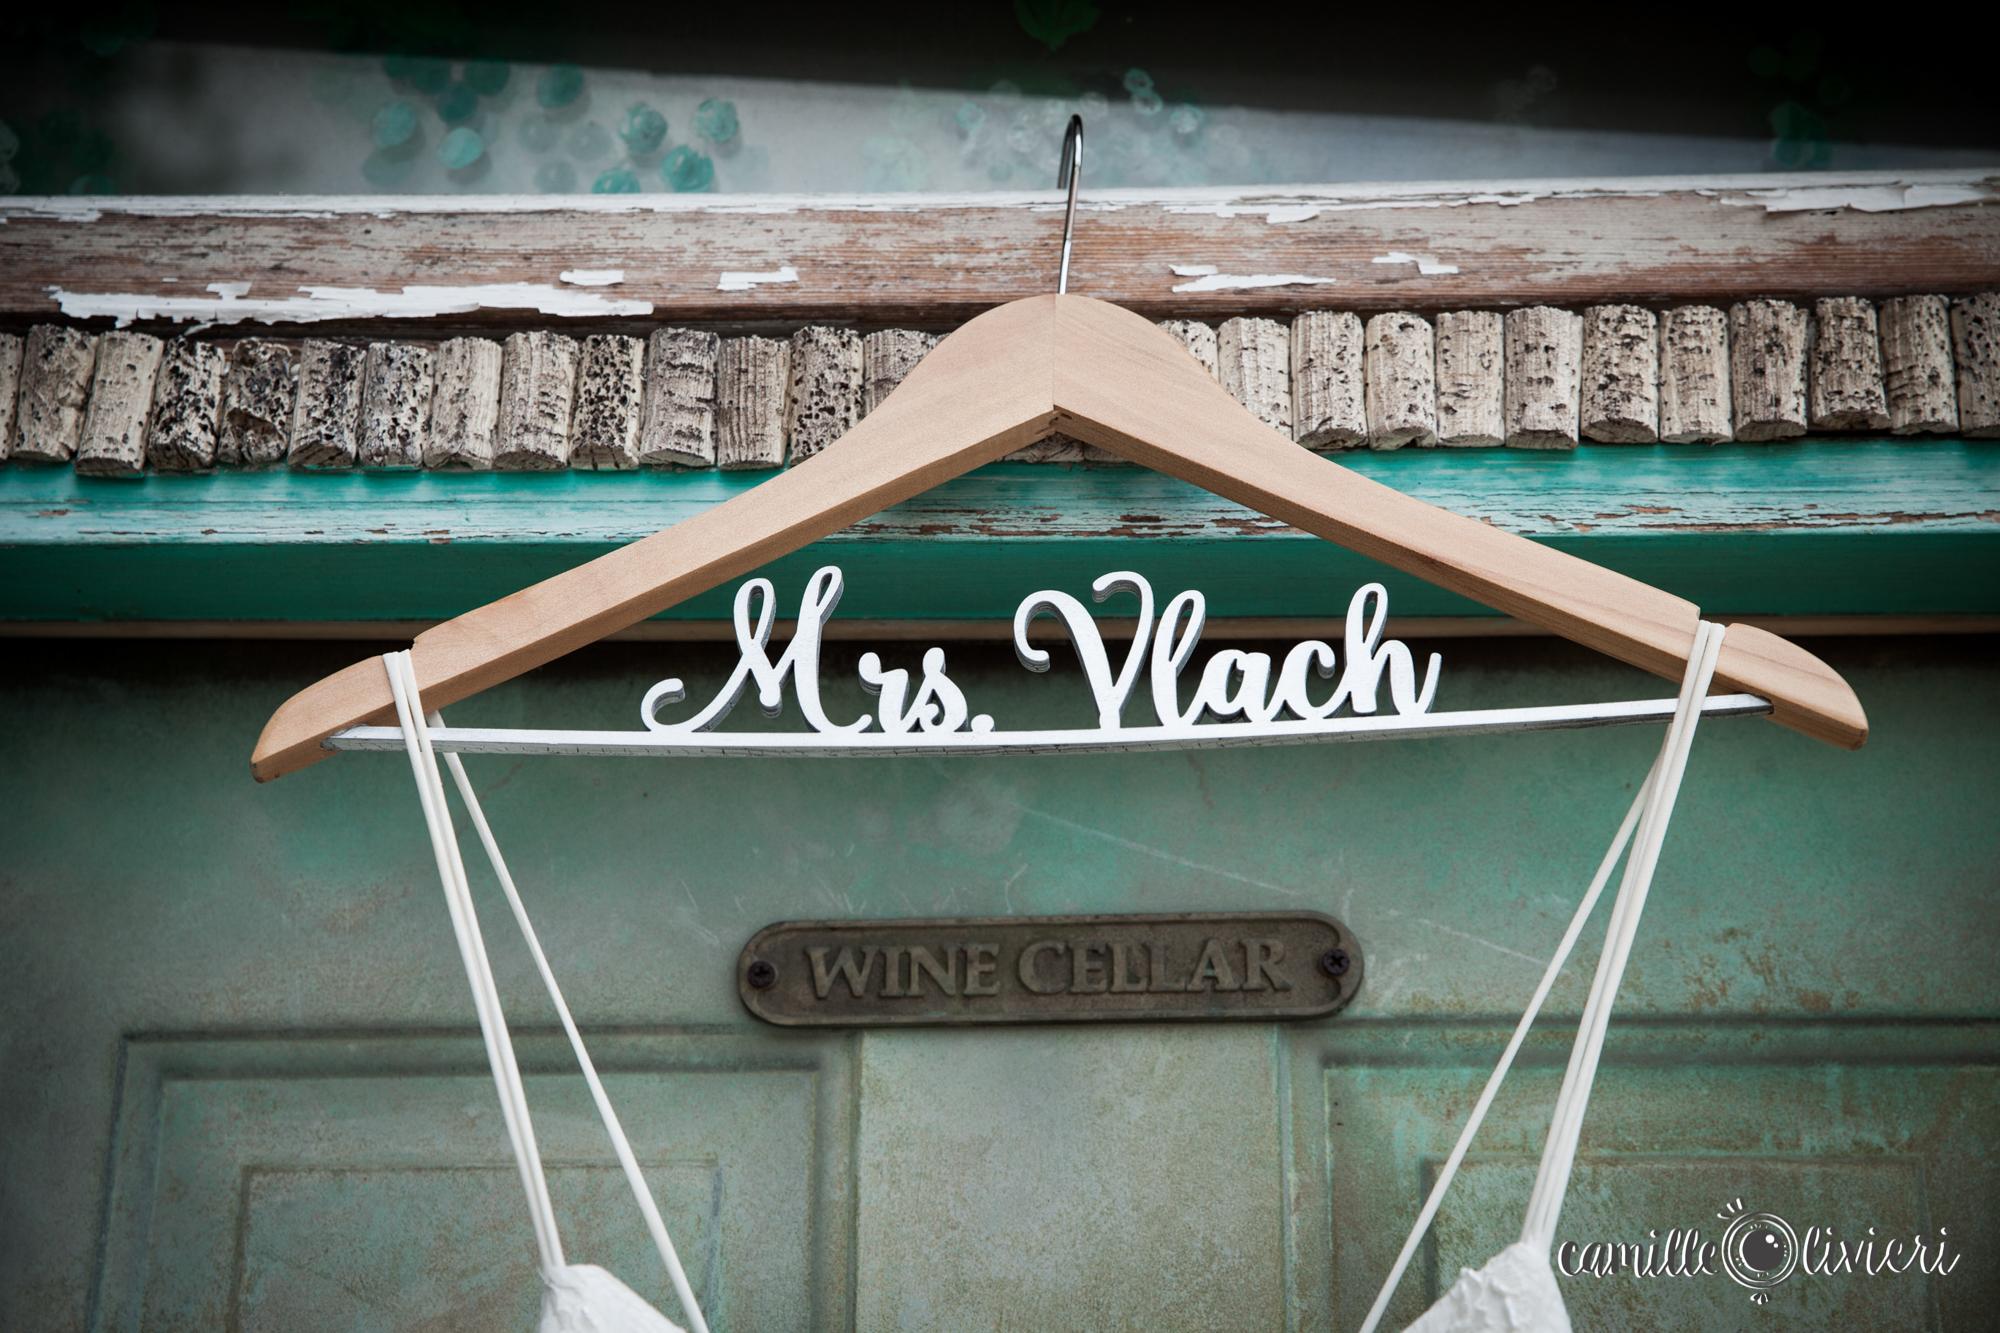 photographe_grenoble_mariage-camille-olivieri-4